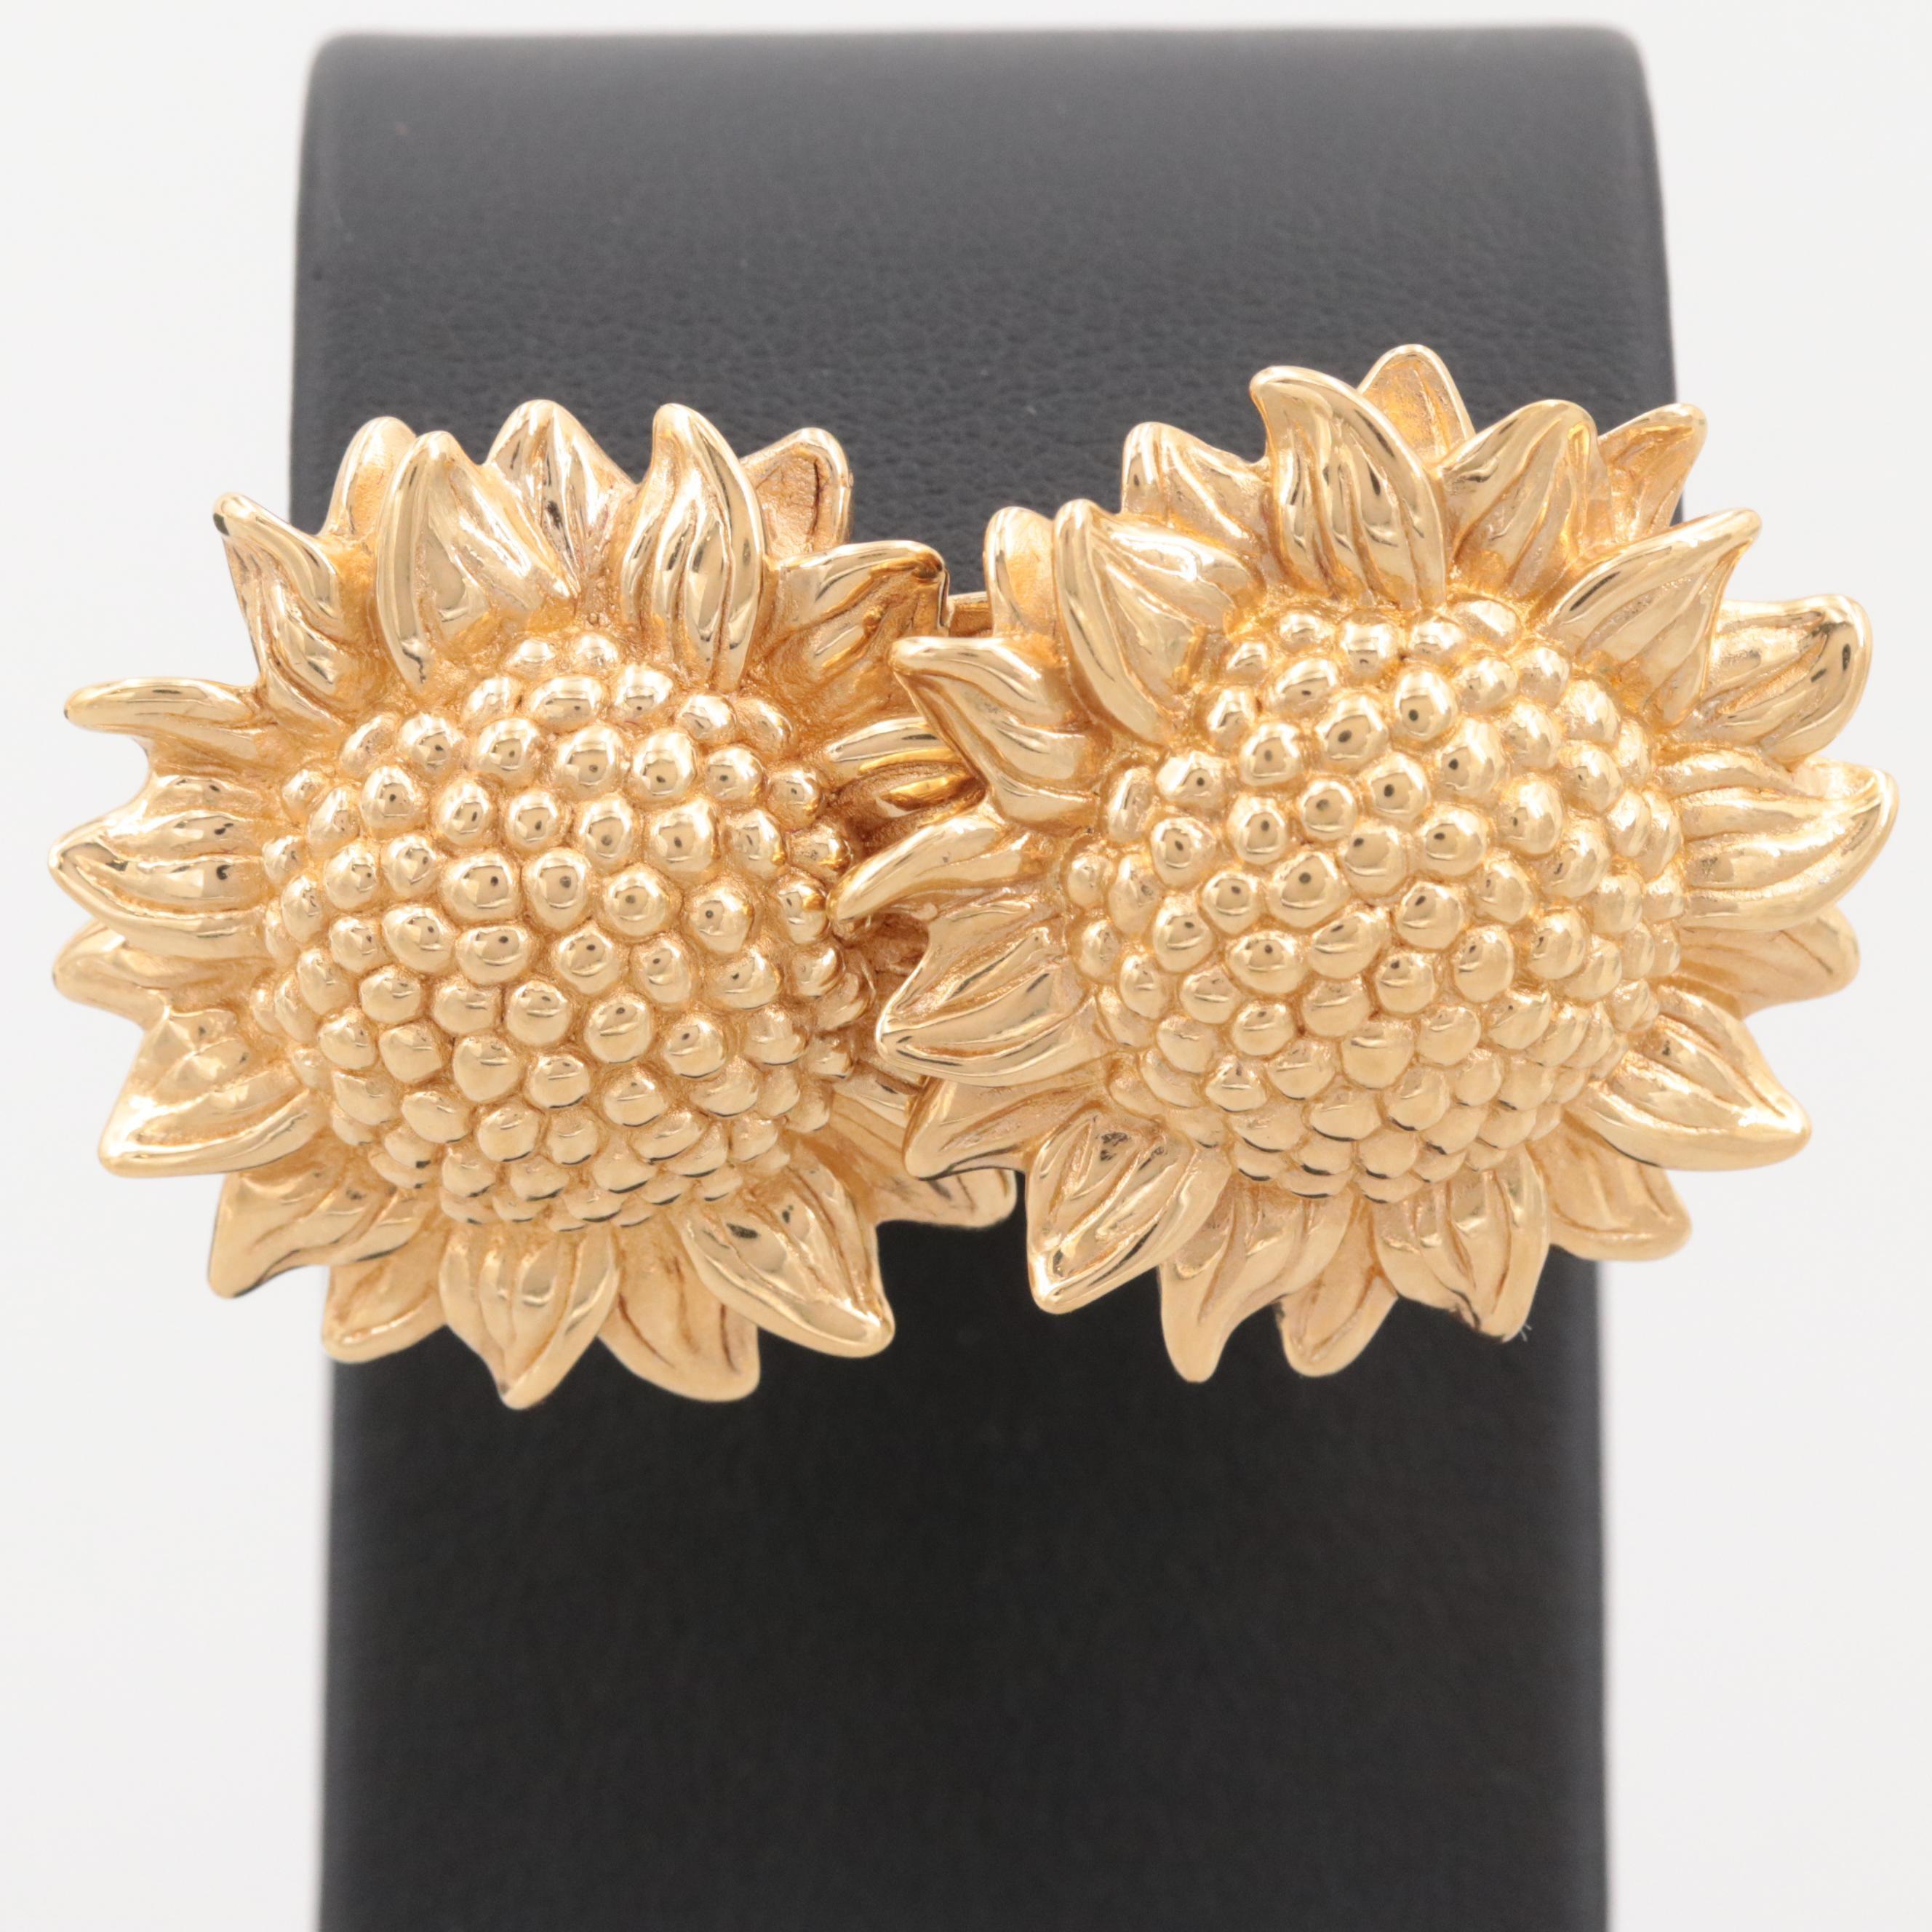 14K Yellow Gold Sunflower Earrings